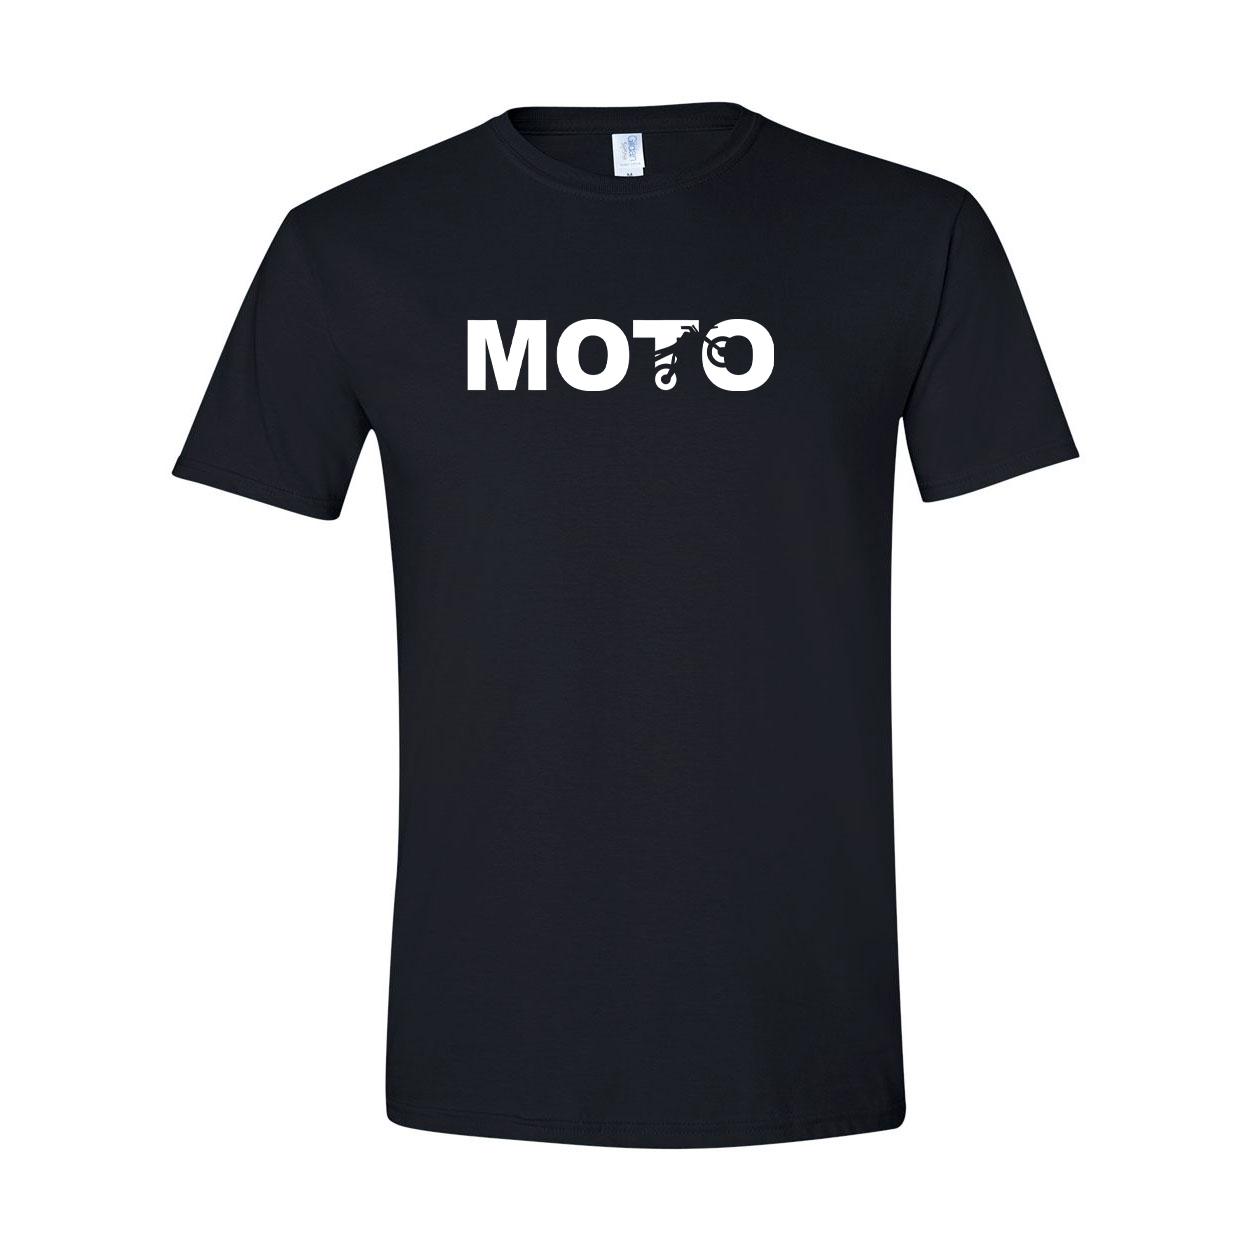 Moto Wheelie Logo Classic T-Shirt Black (White Logo)